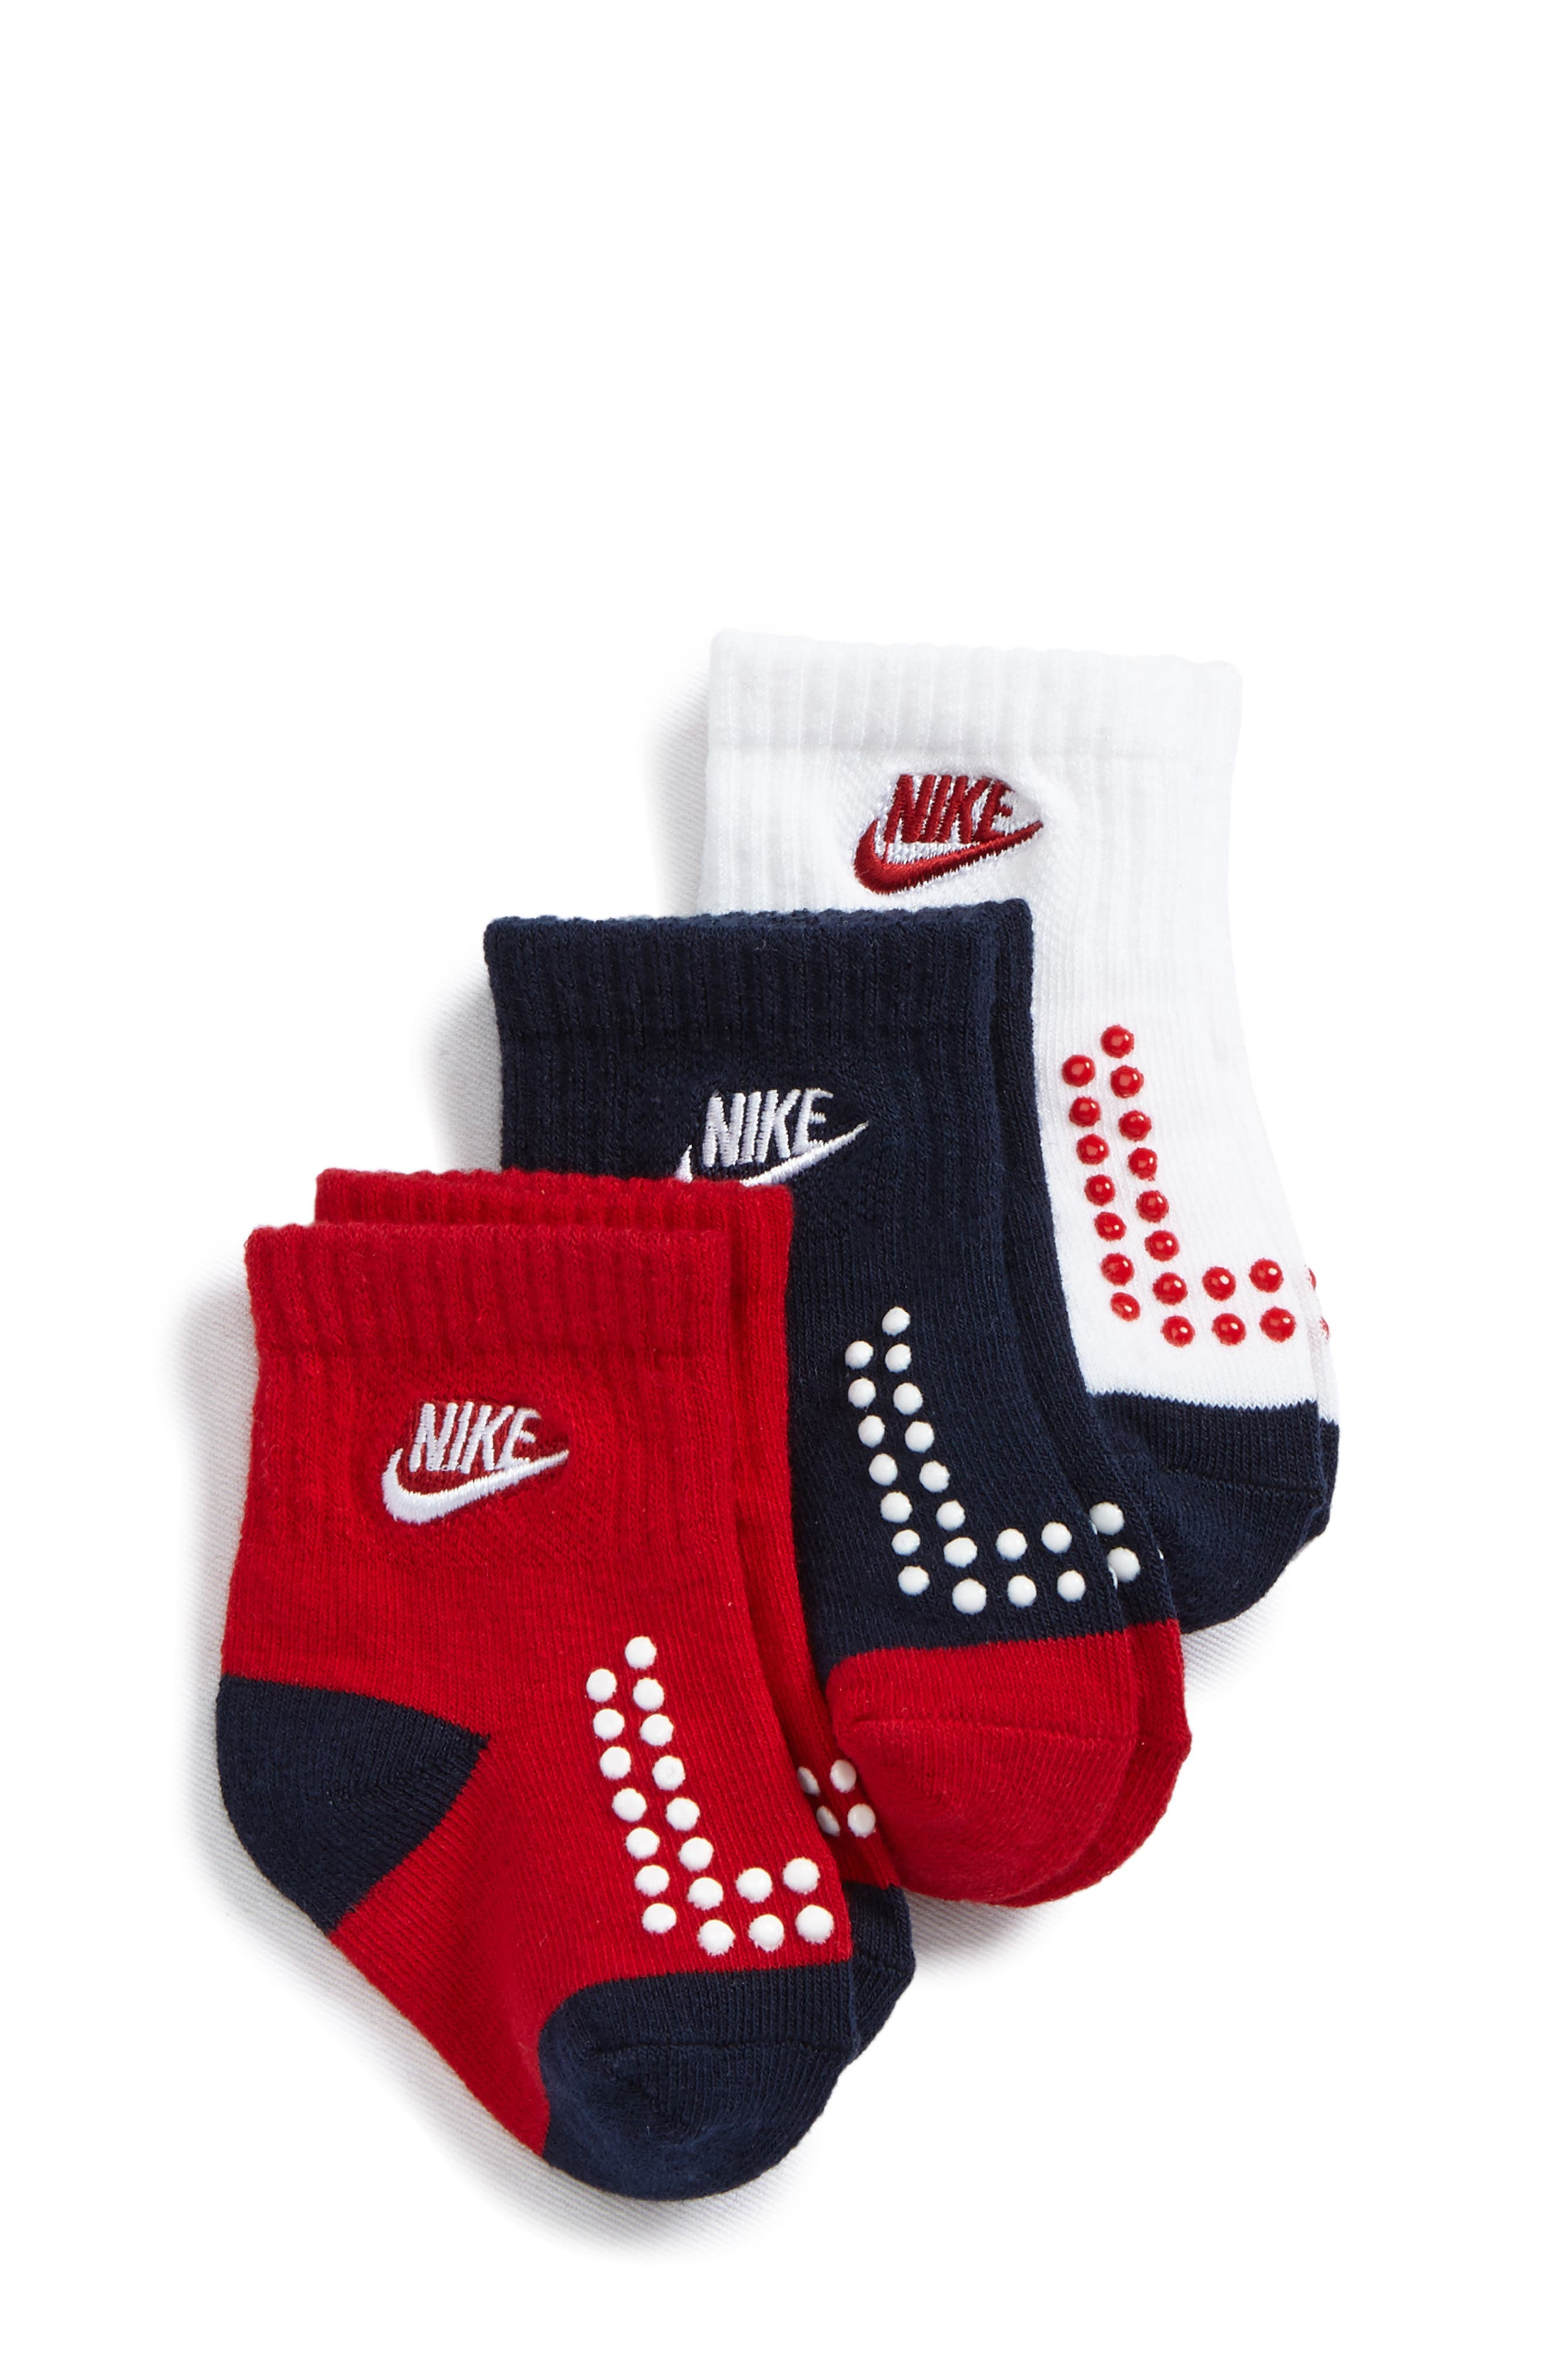 Futura 3-Pack Gripper Socks,                             Main thumbnail 1, color,                             GYM RED